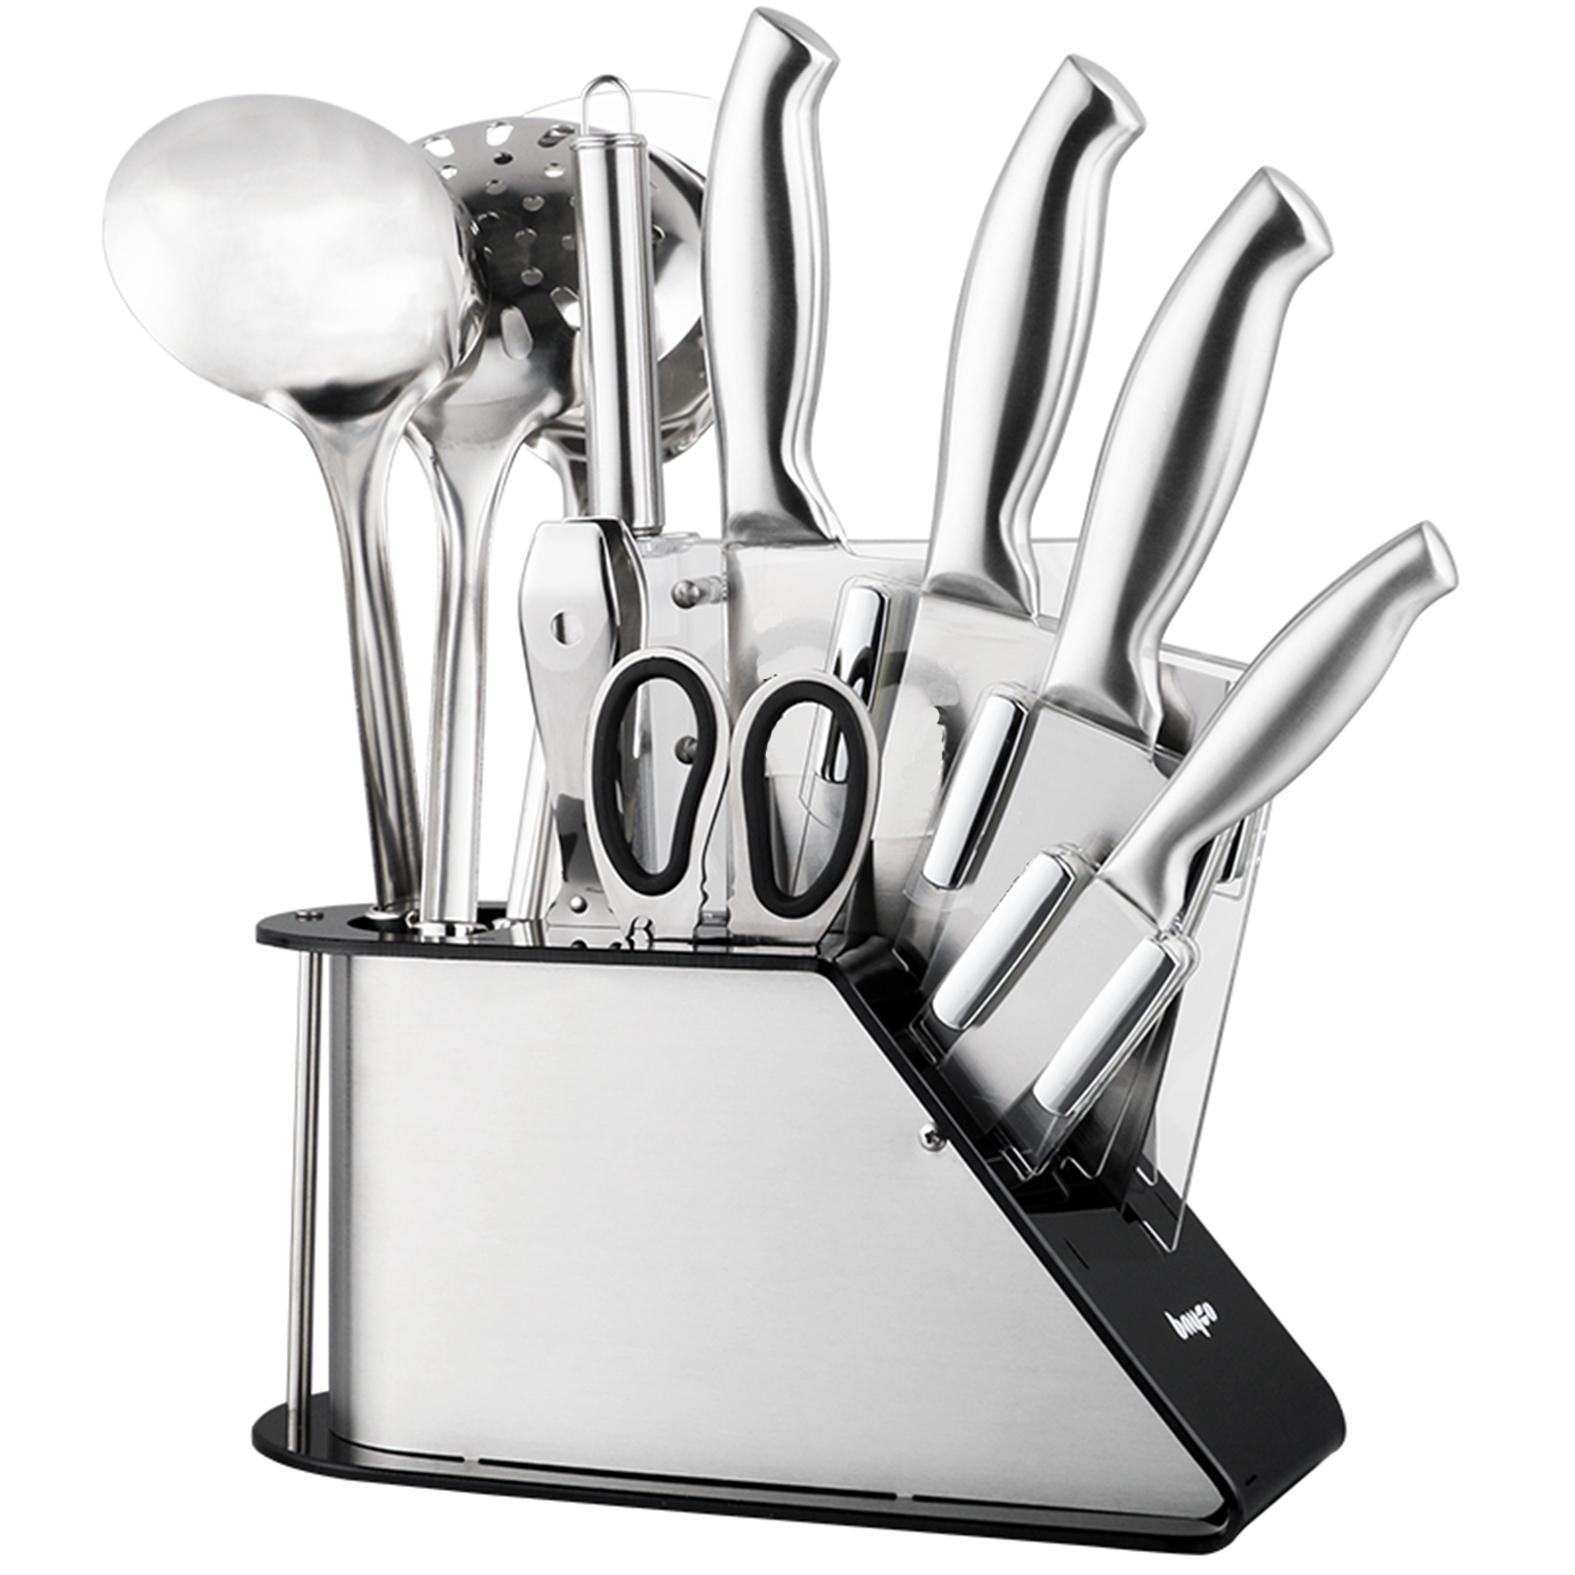 Jiji (platinum 304 Stainless Steel Kitchen 9 Pcs Set) / Kitchen Utensils / Cookware (sg) By Jiji.